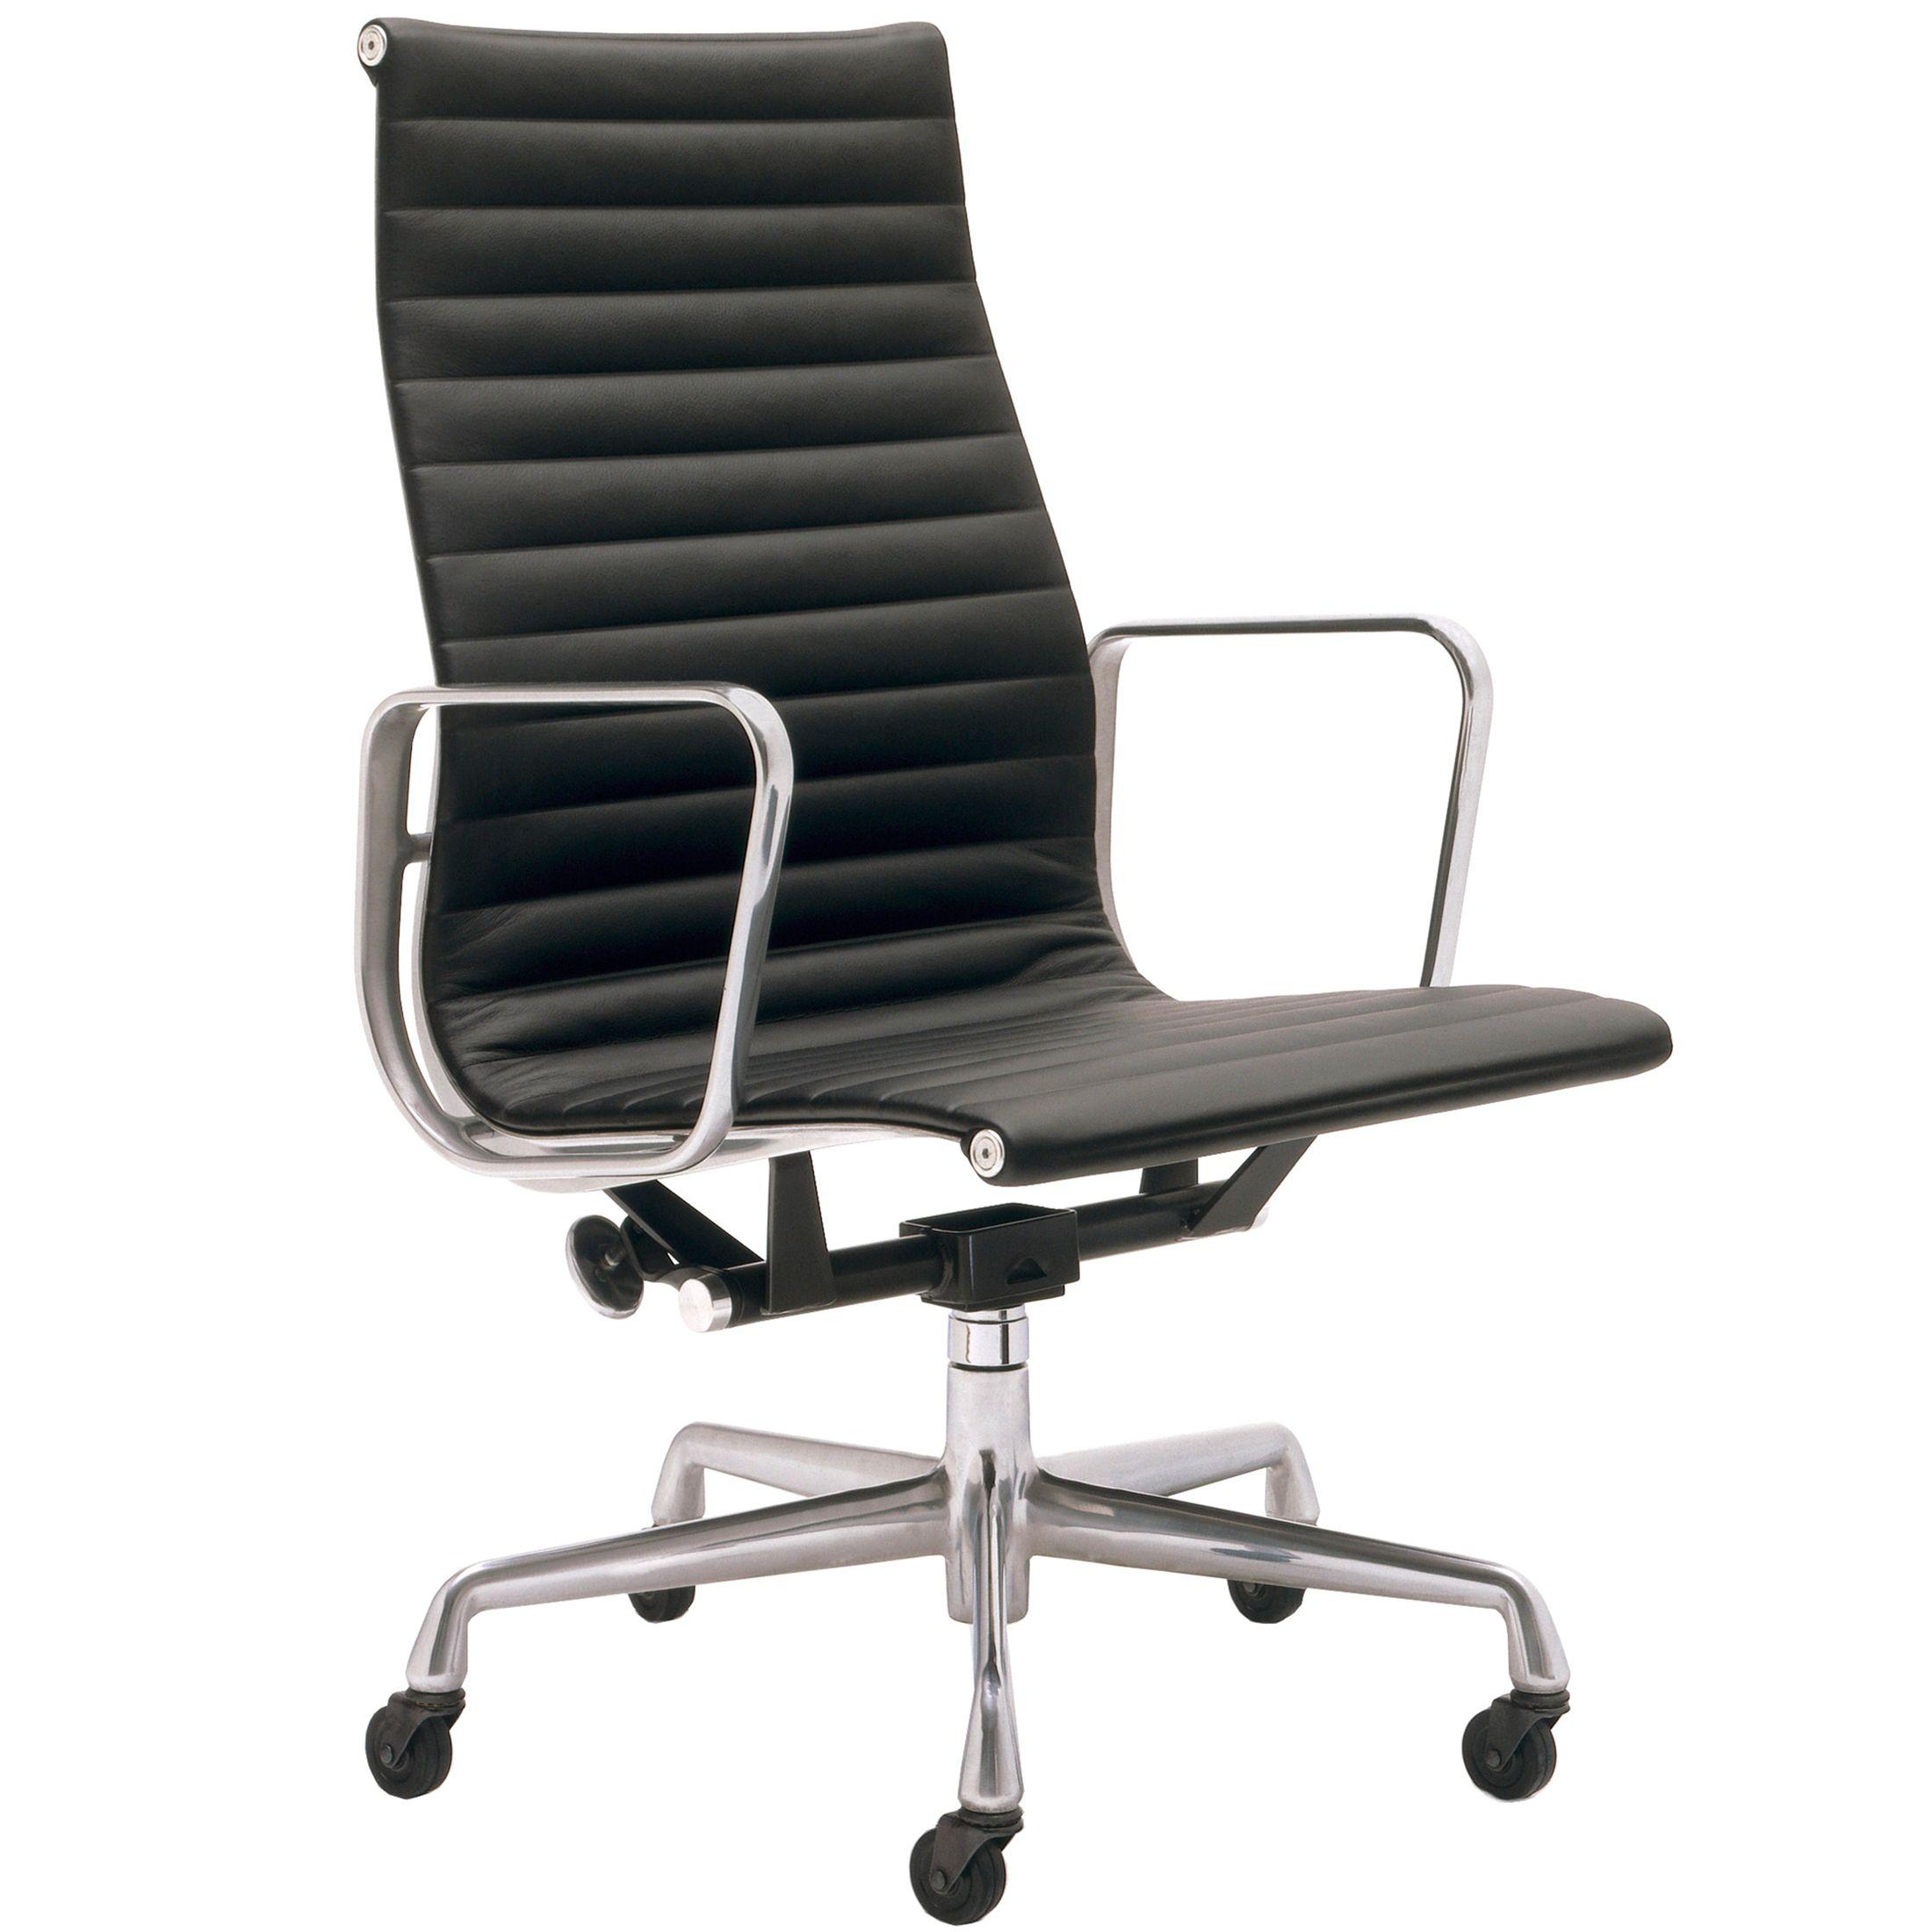 Vitra EA 119 bureaustoel leder zwart onderstel verchroomd kopen